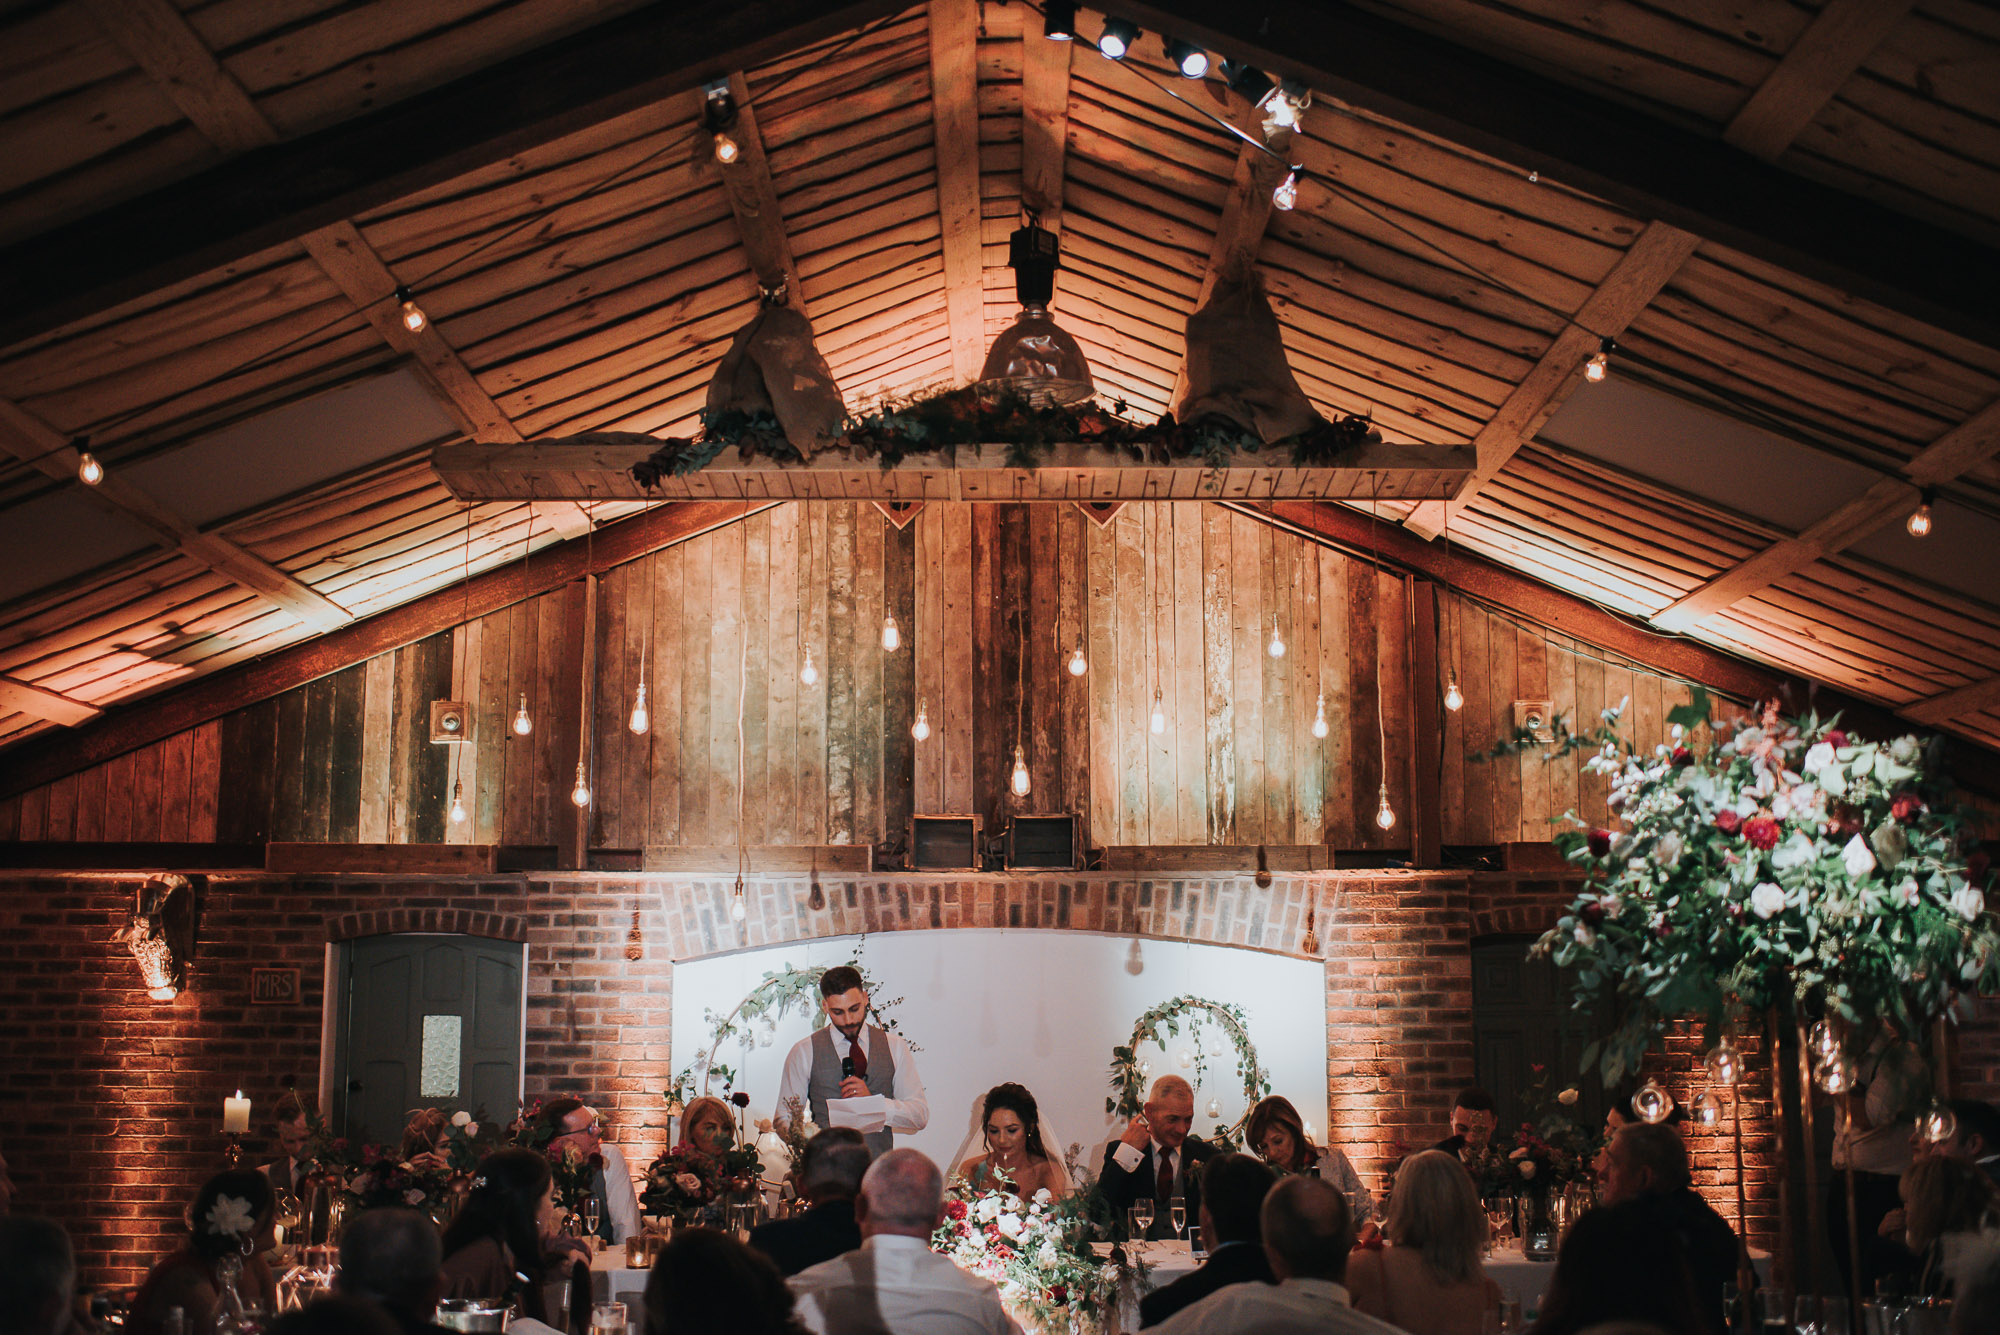 Owen house wedding barn wedding photographer north west cheshire england (5 of 10).jpg